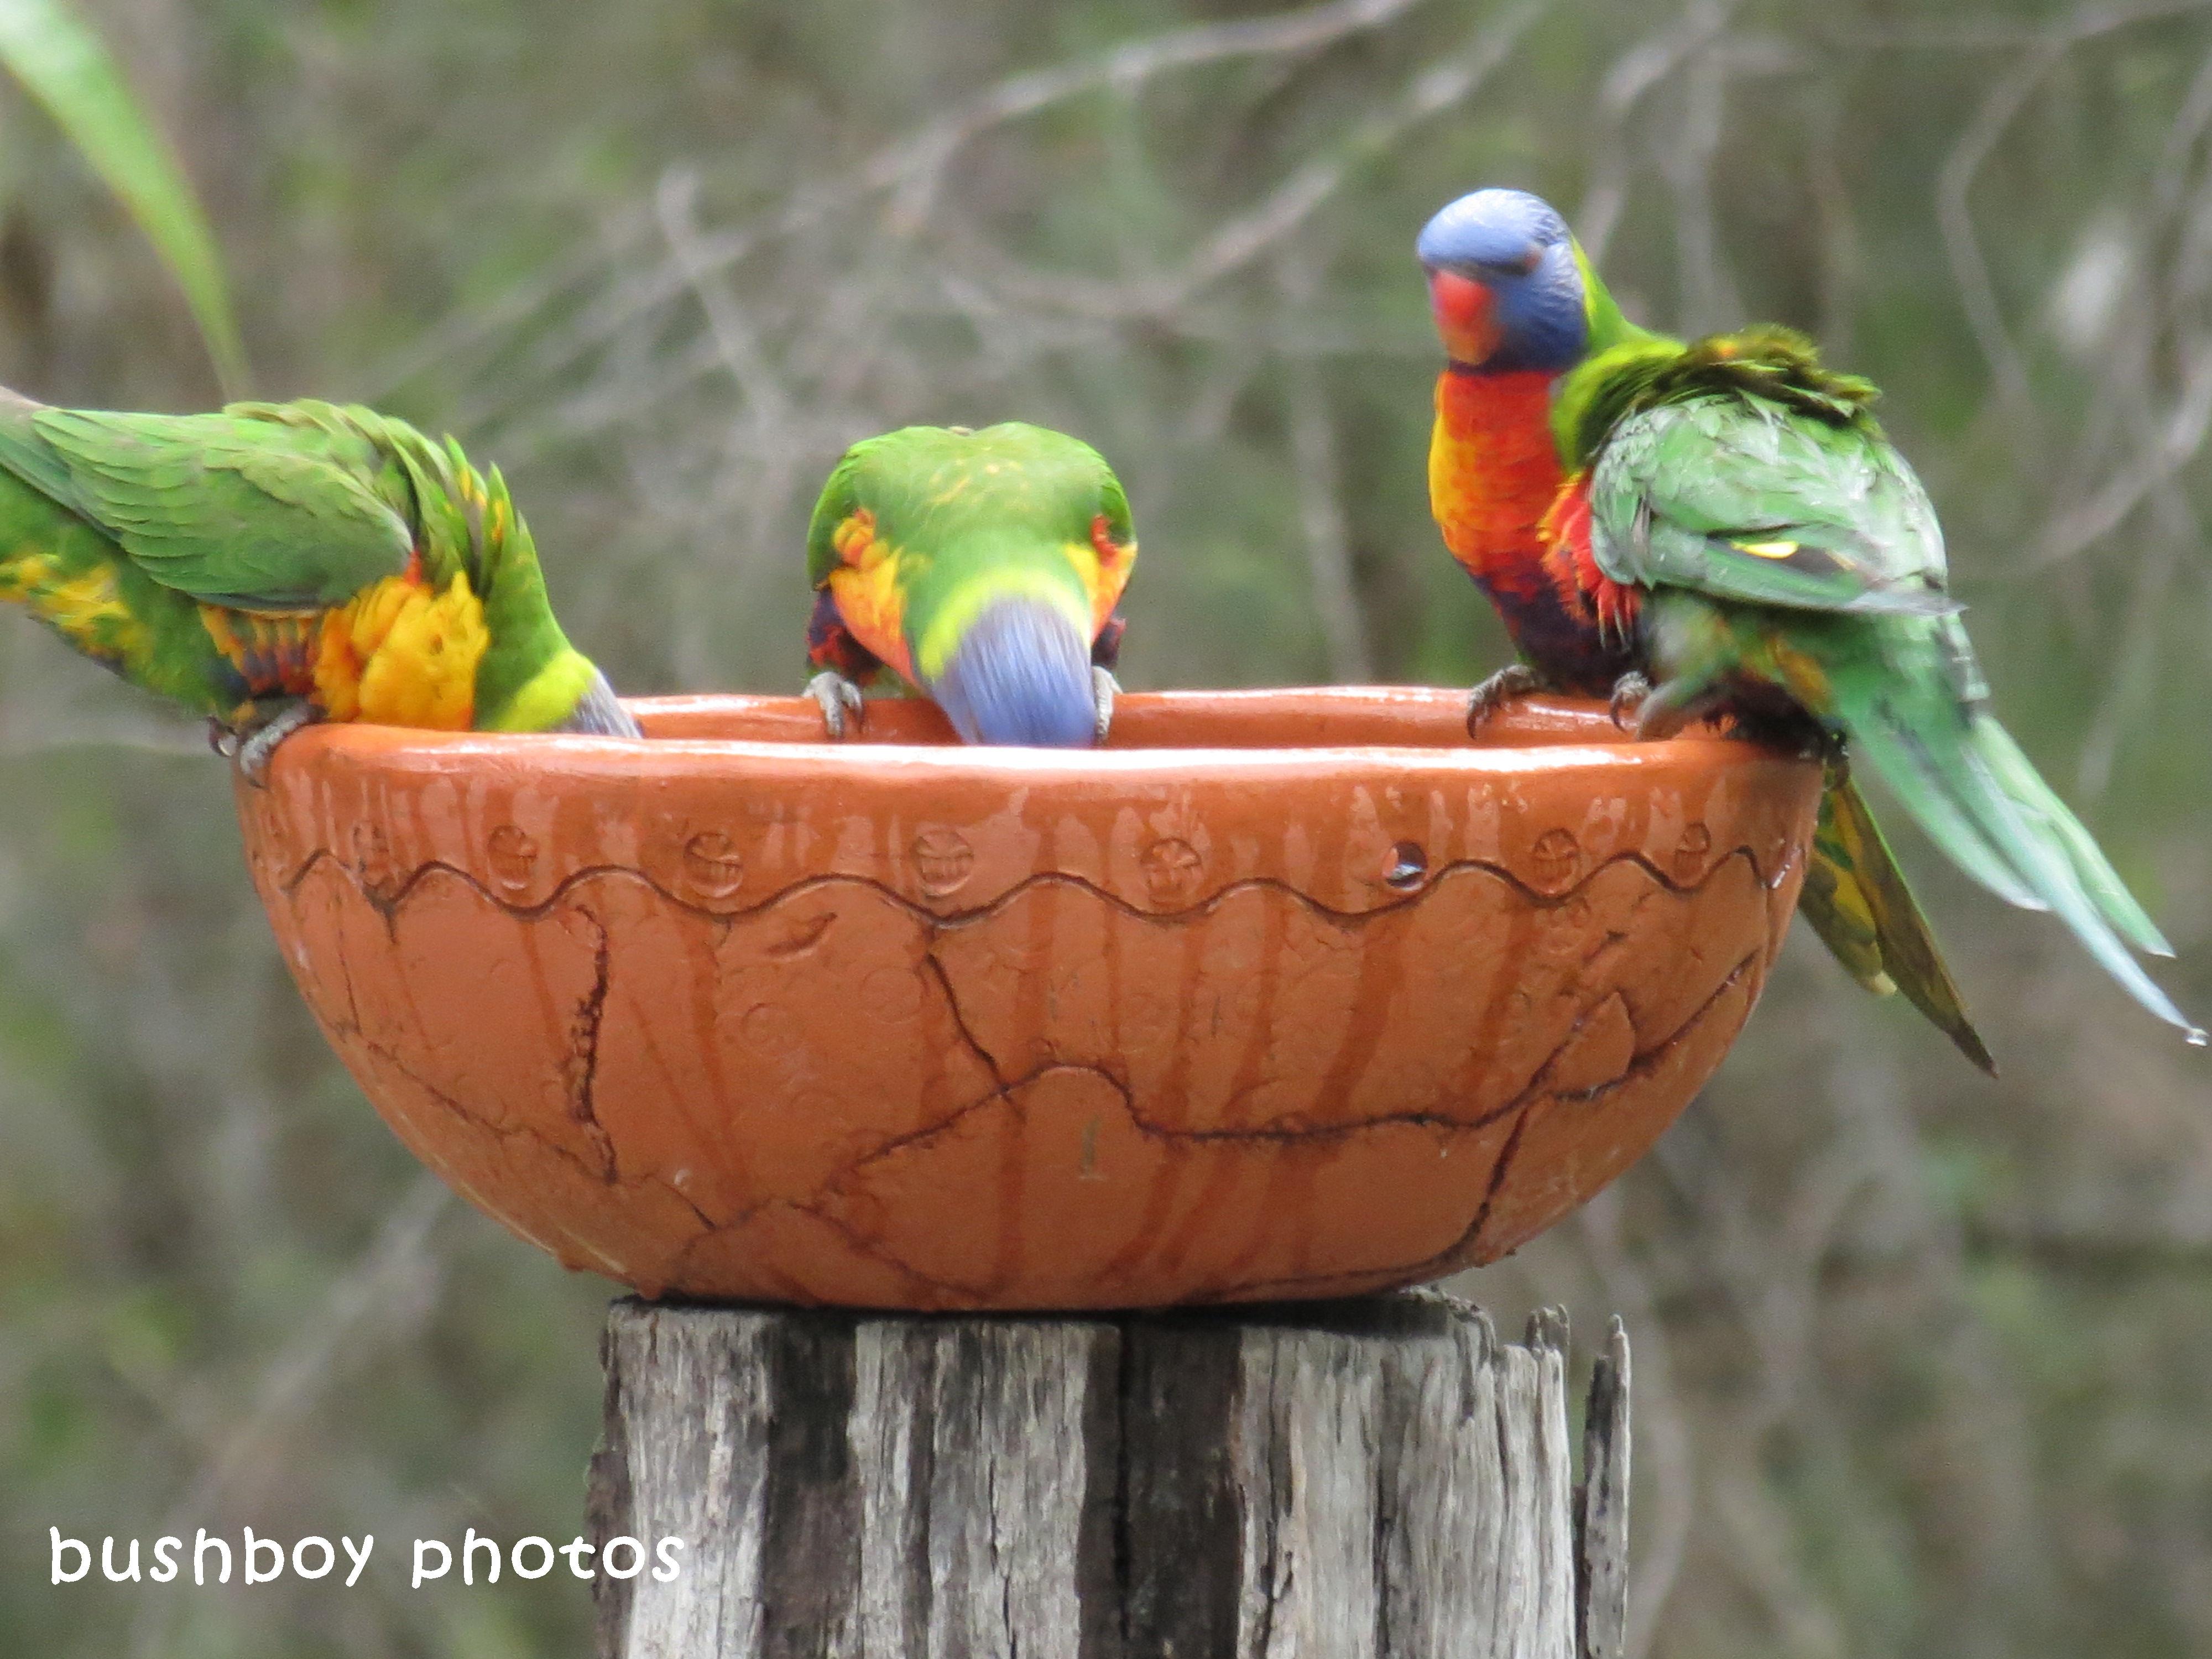 180329_blog challenge_quartet_rainbow lorikeets5